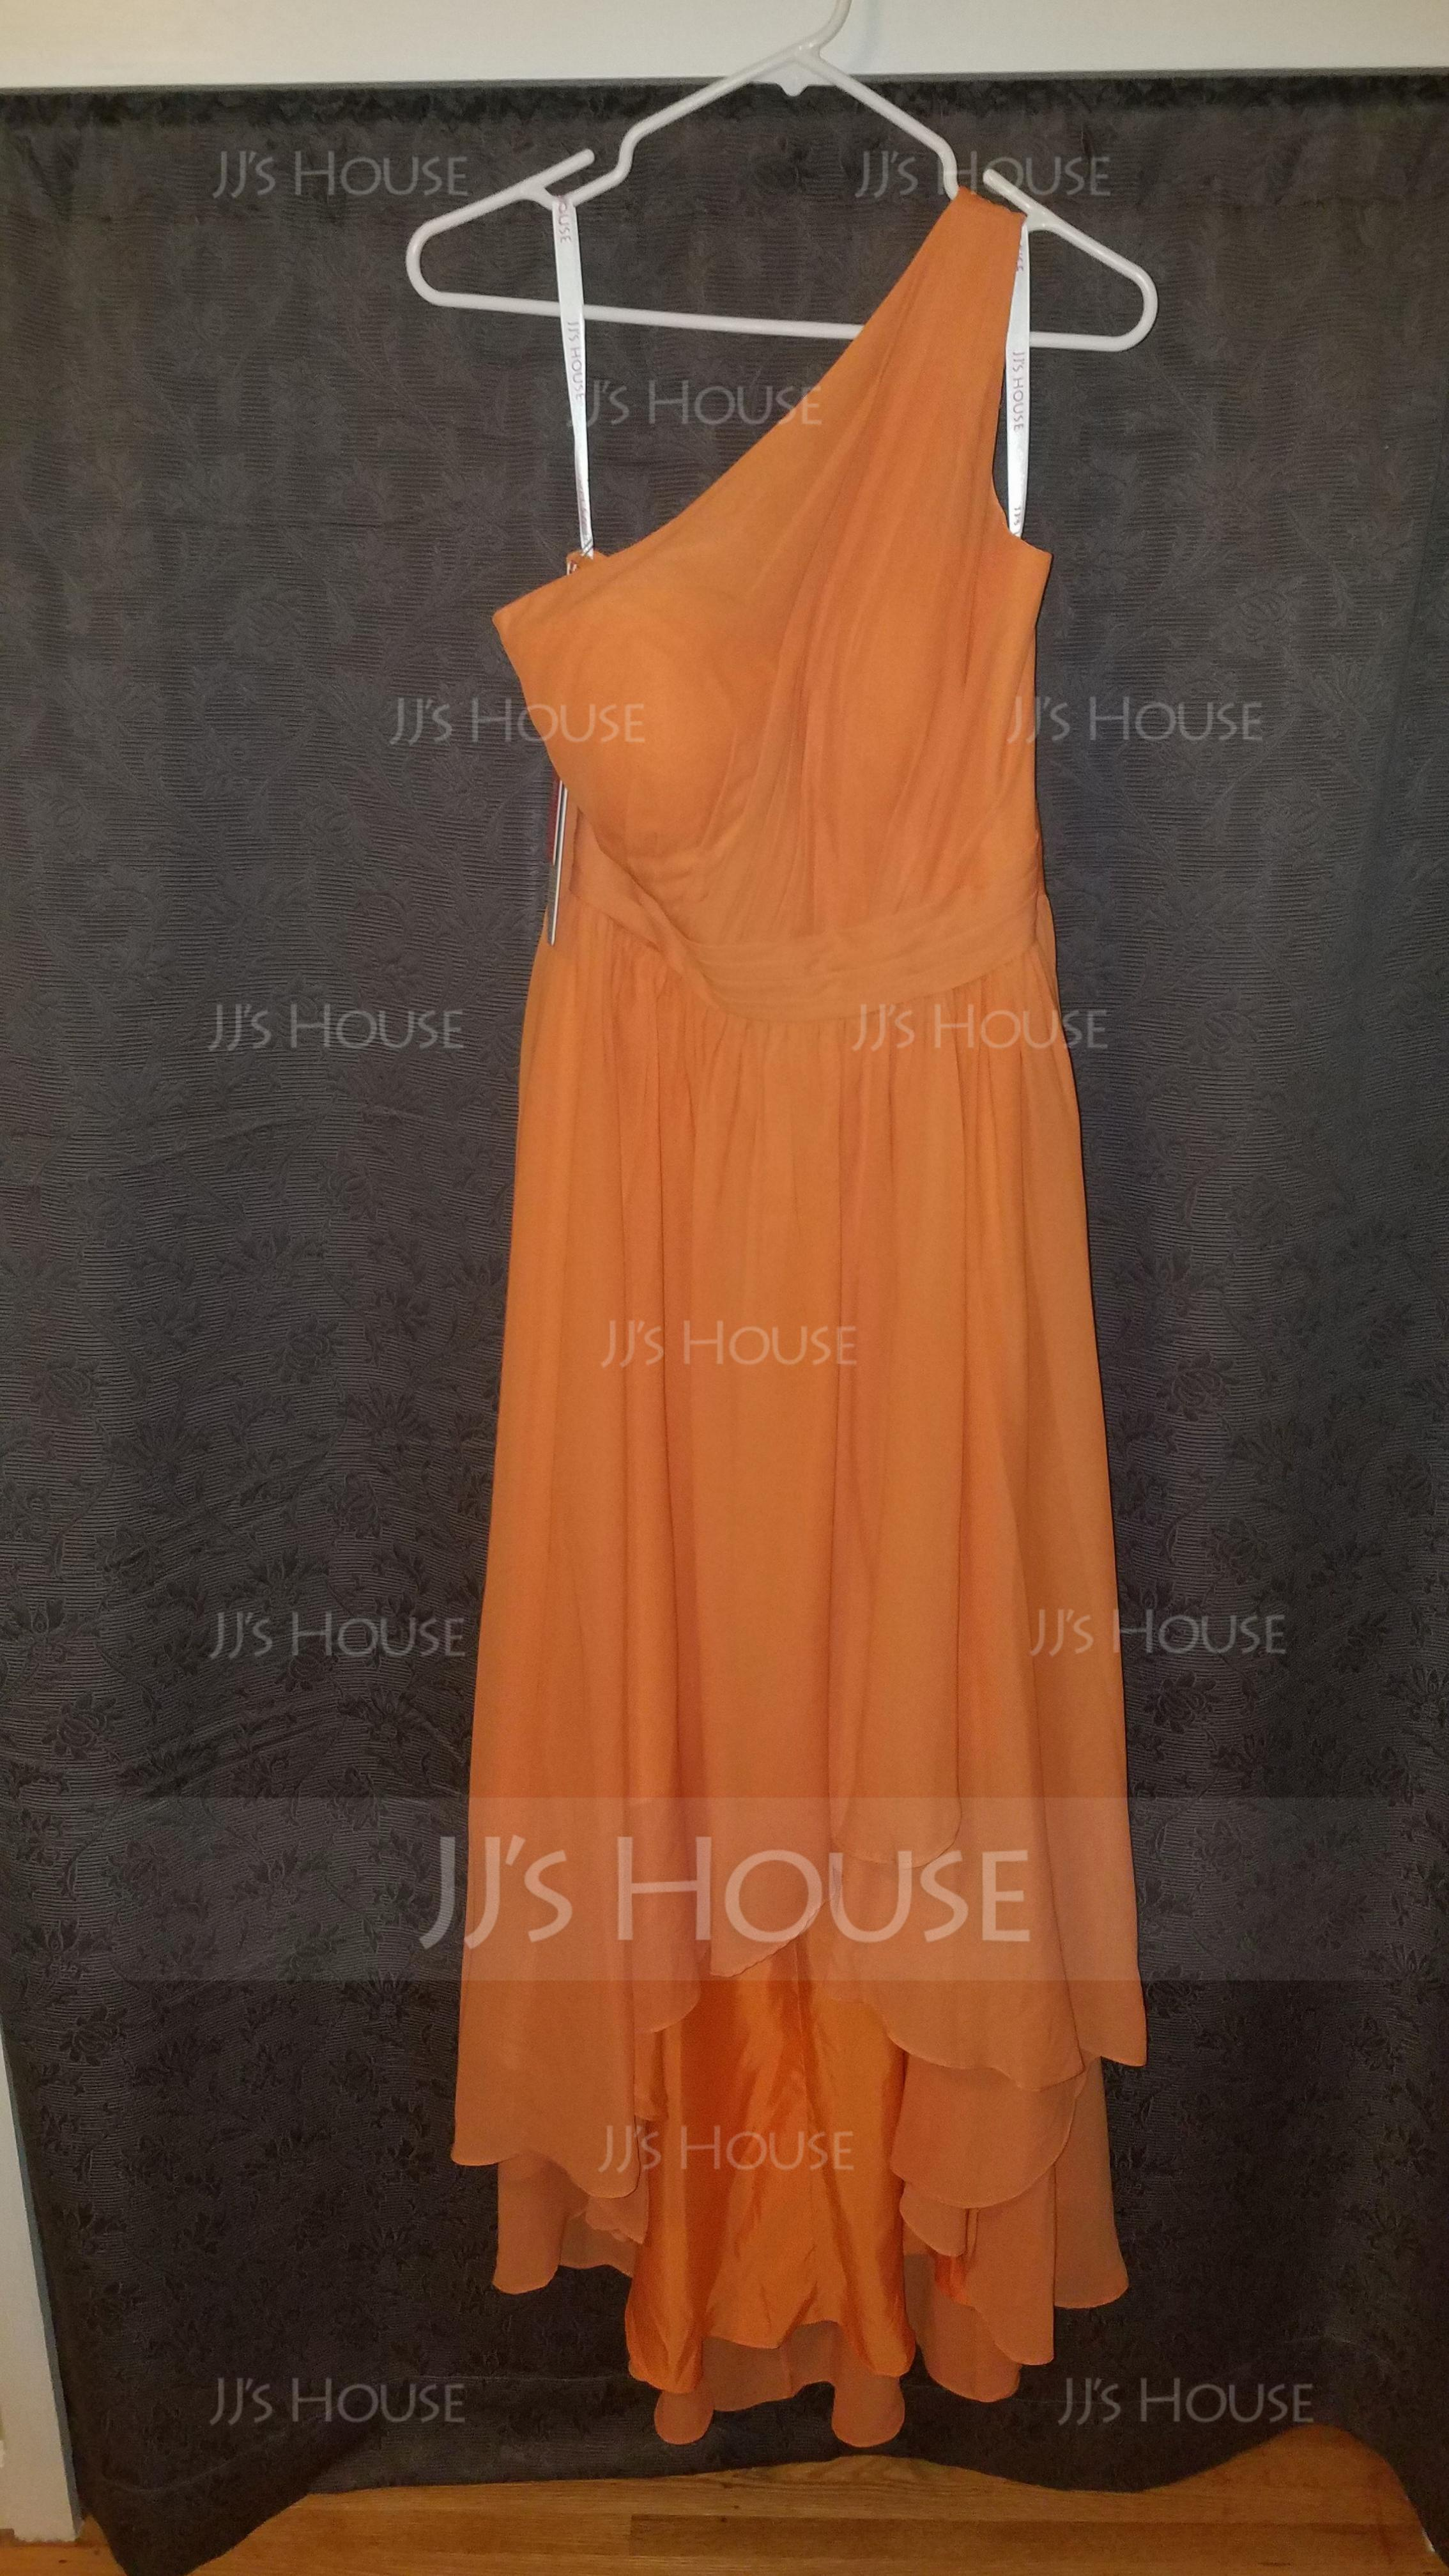 A-Line/Princess One-Shoulder Asymmetrical Chiffon Bridesmaid Dress With Cascading Ruffles (266177101)